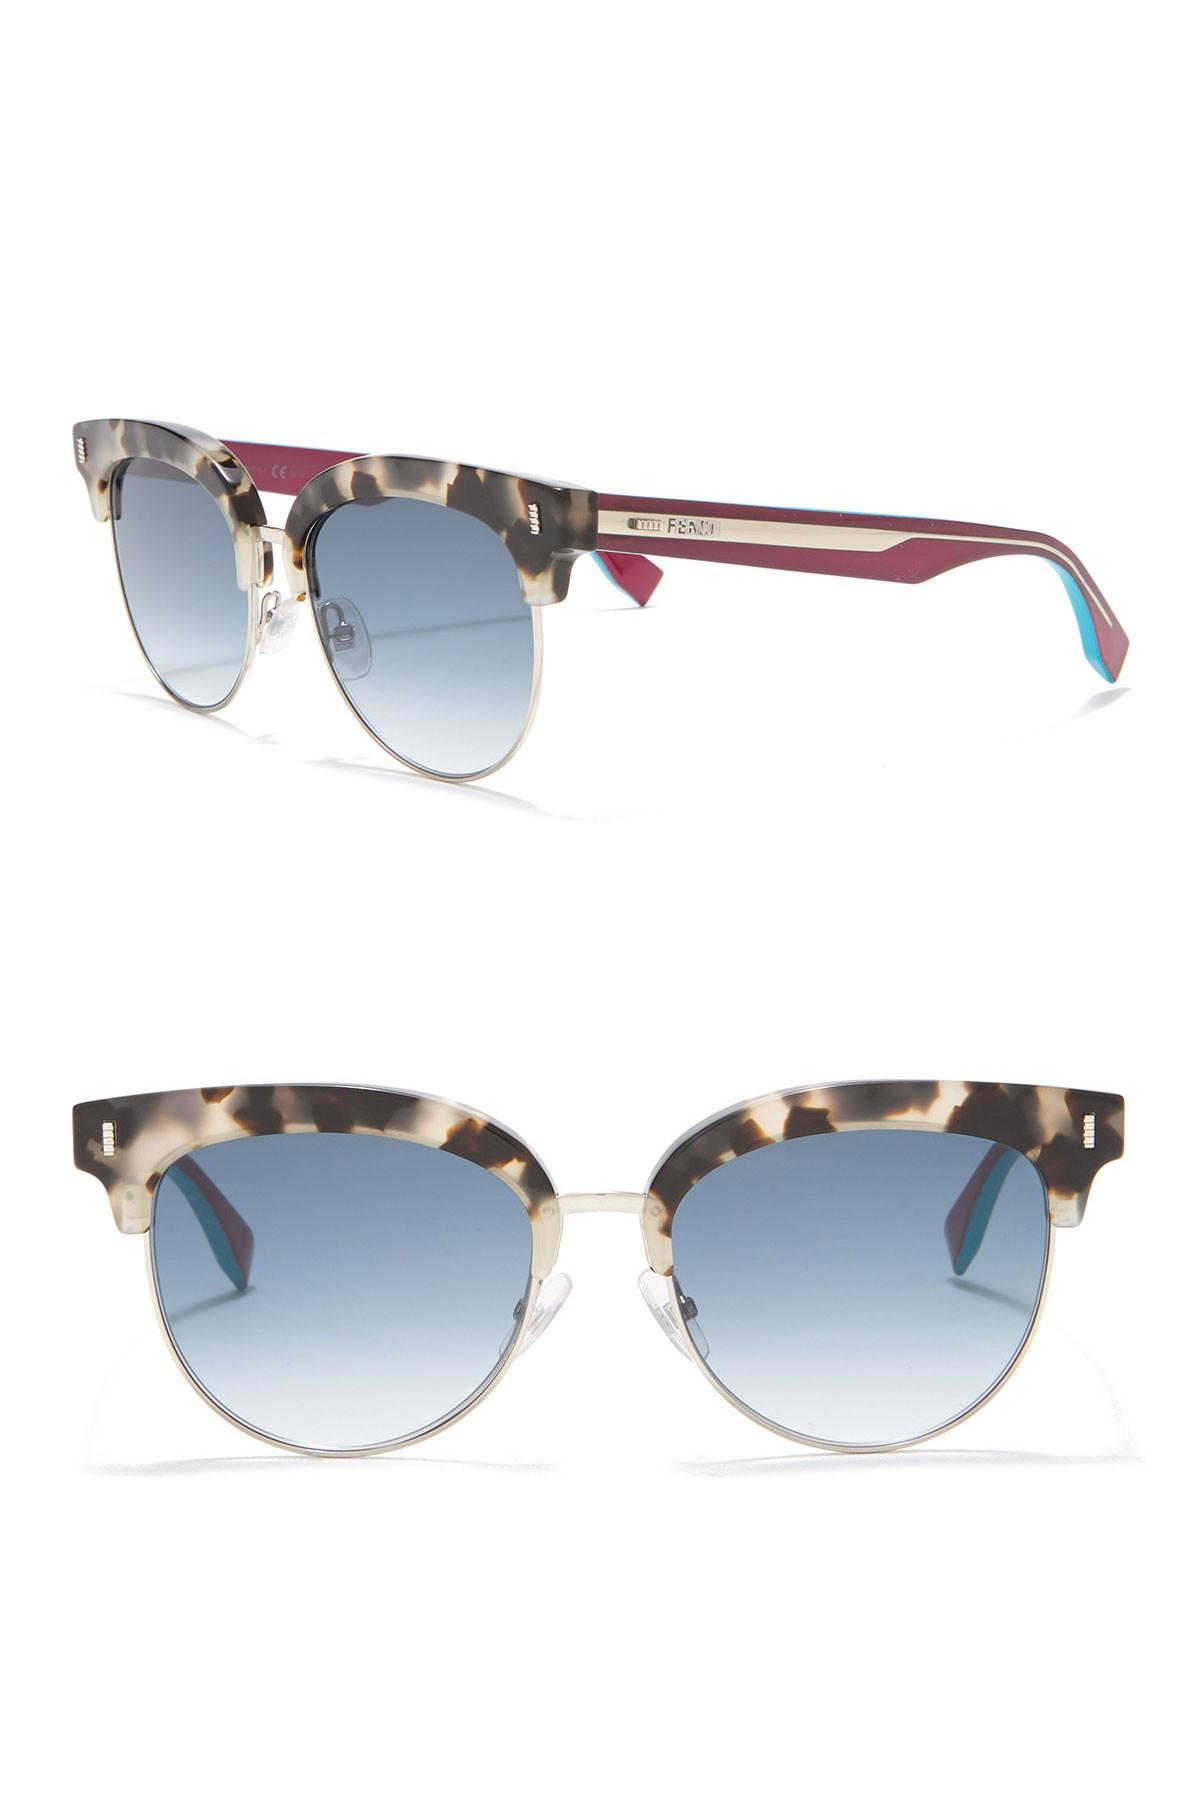 03cba4614b Fendi - Blue Women s 54mm Browline Sunglasses - Lyst. View fullscreen